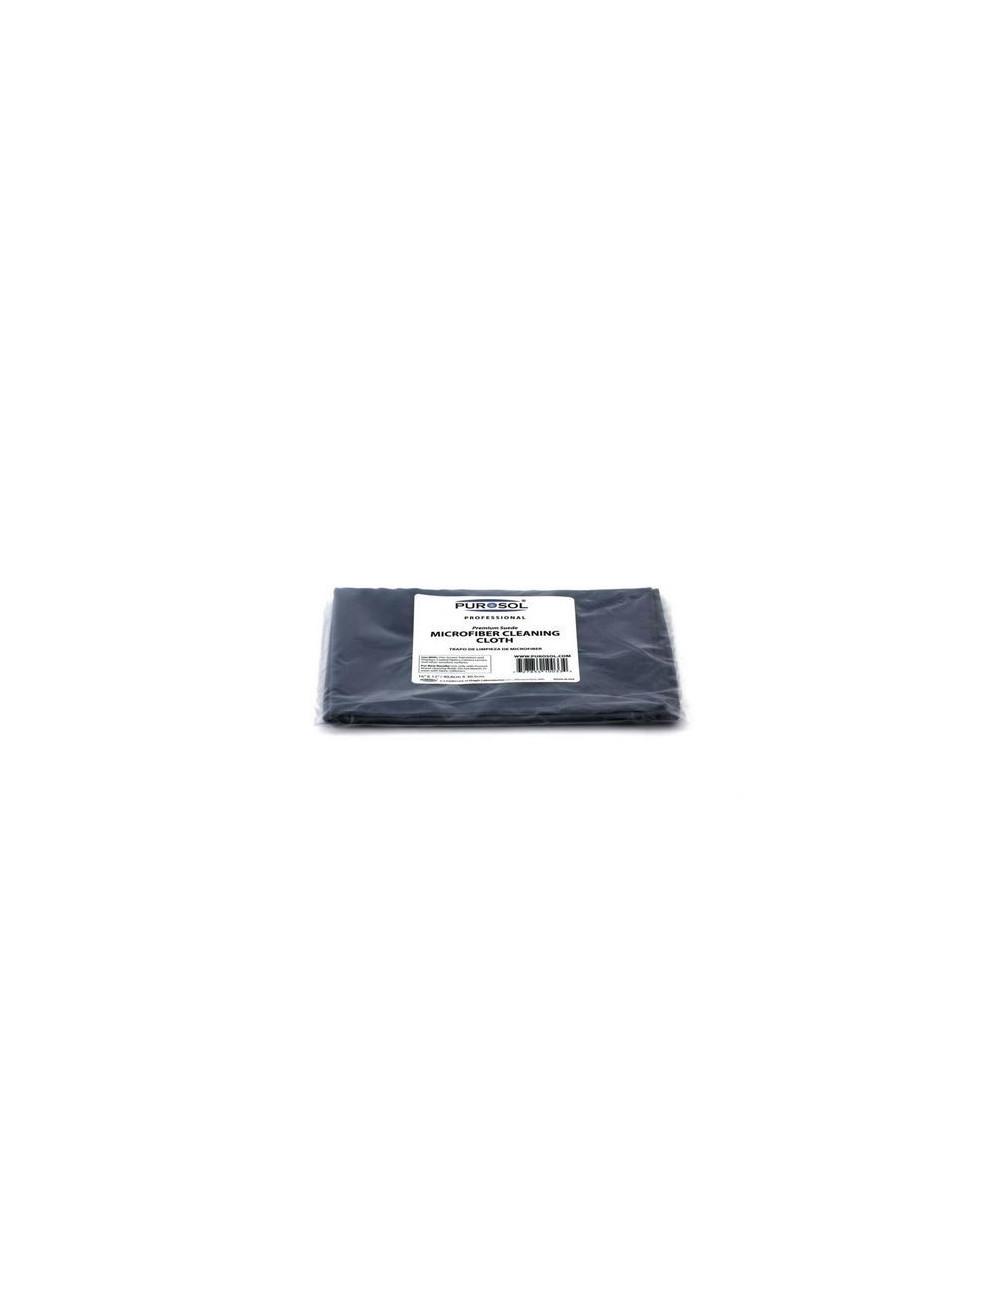 Lingette microfibres Purosol 40x30cm